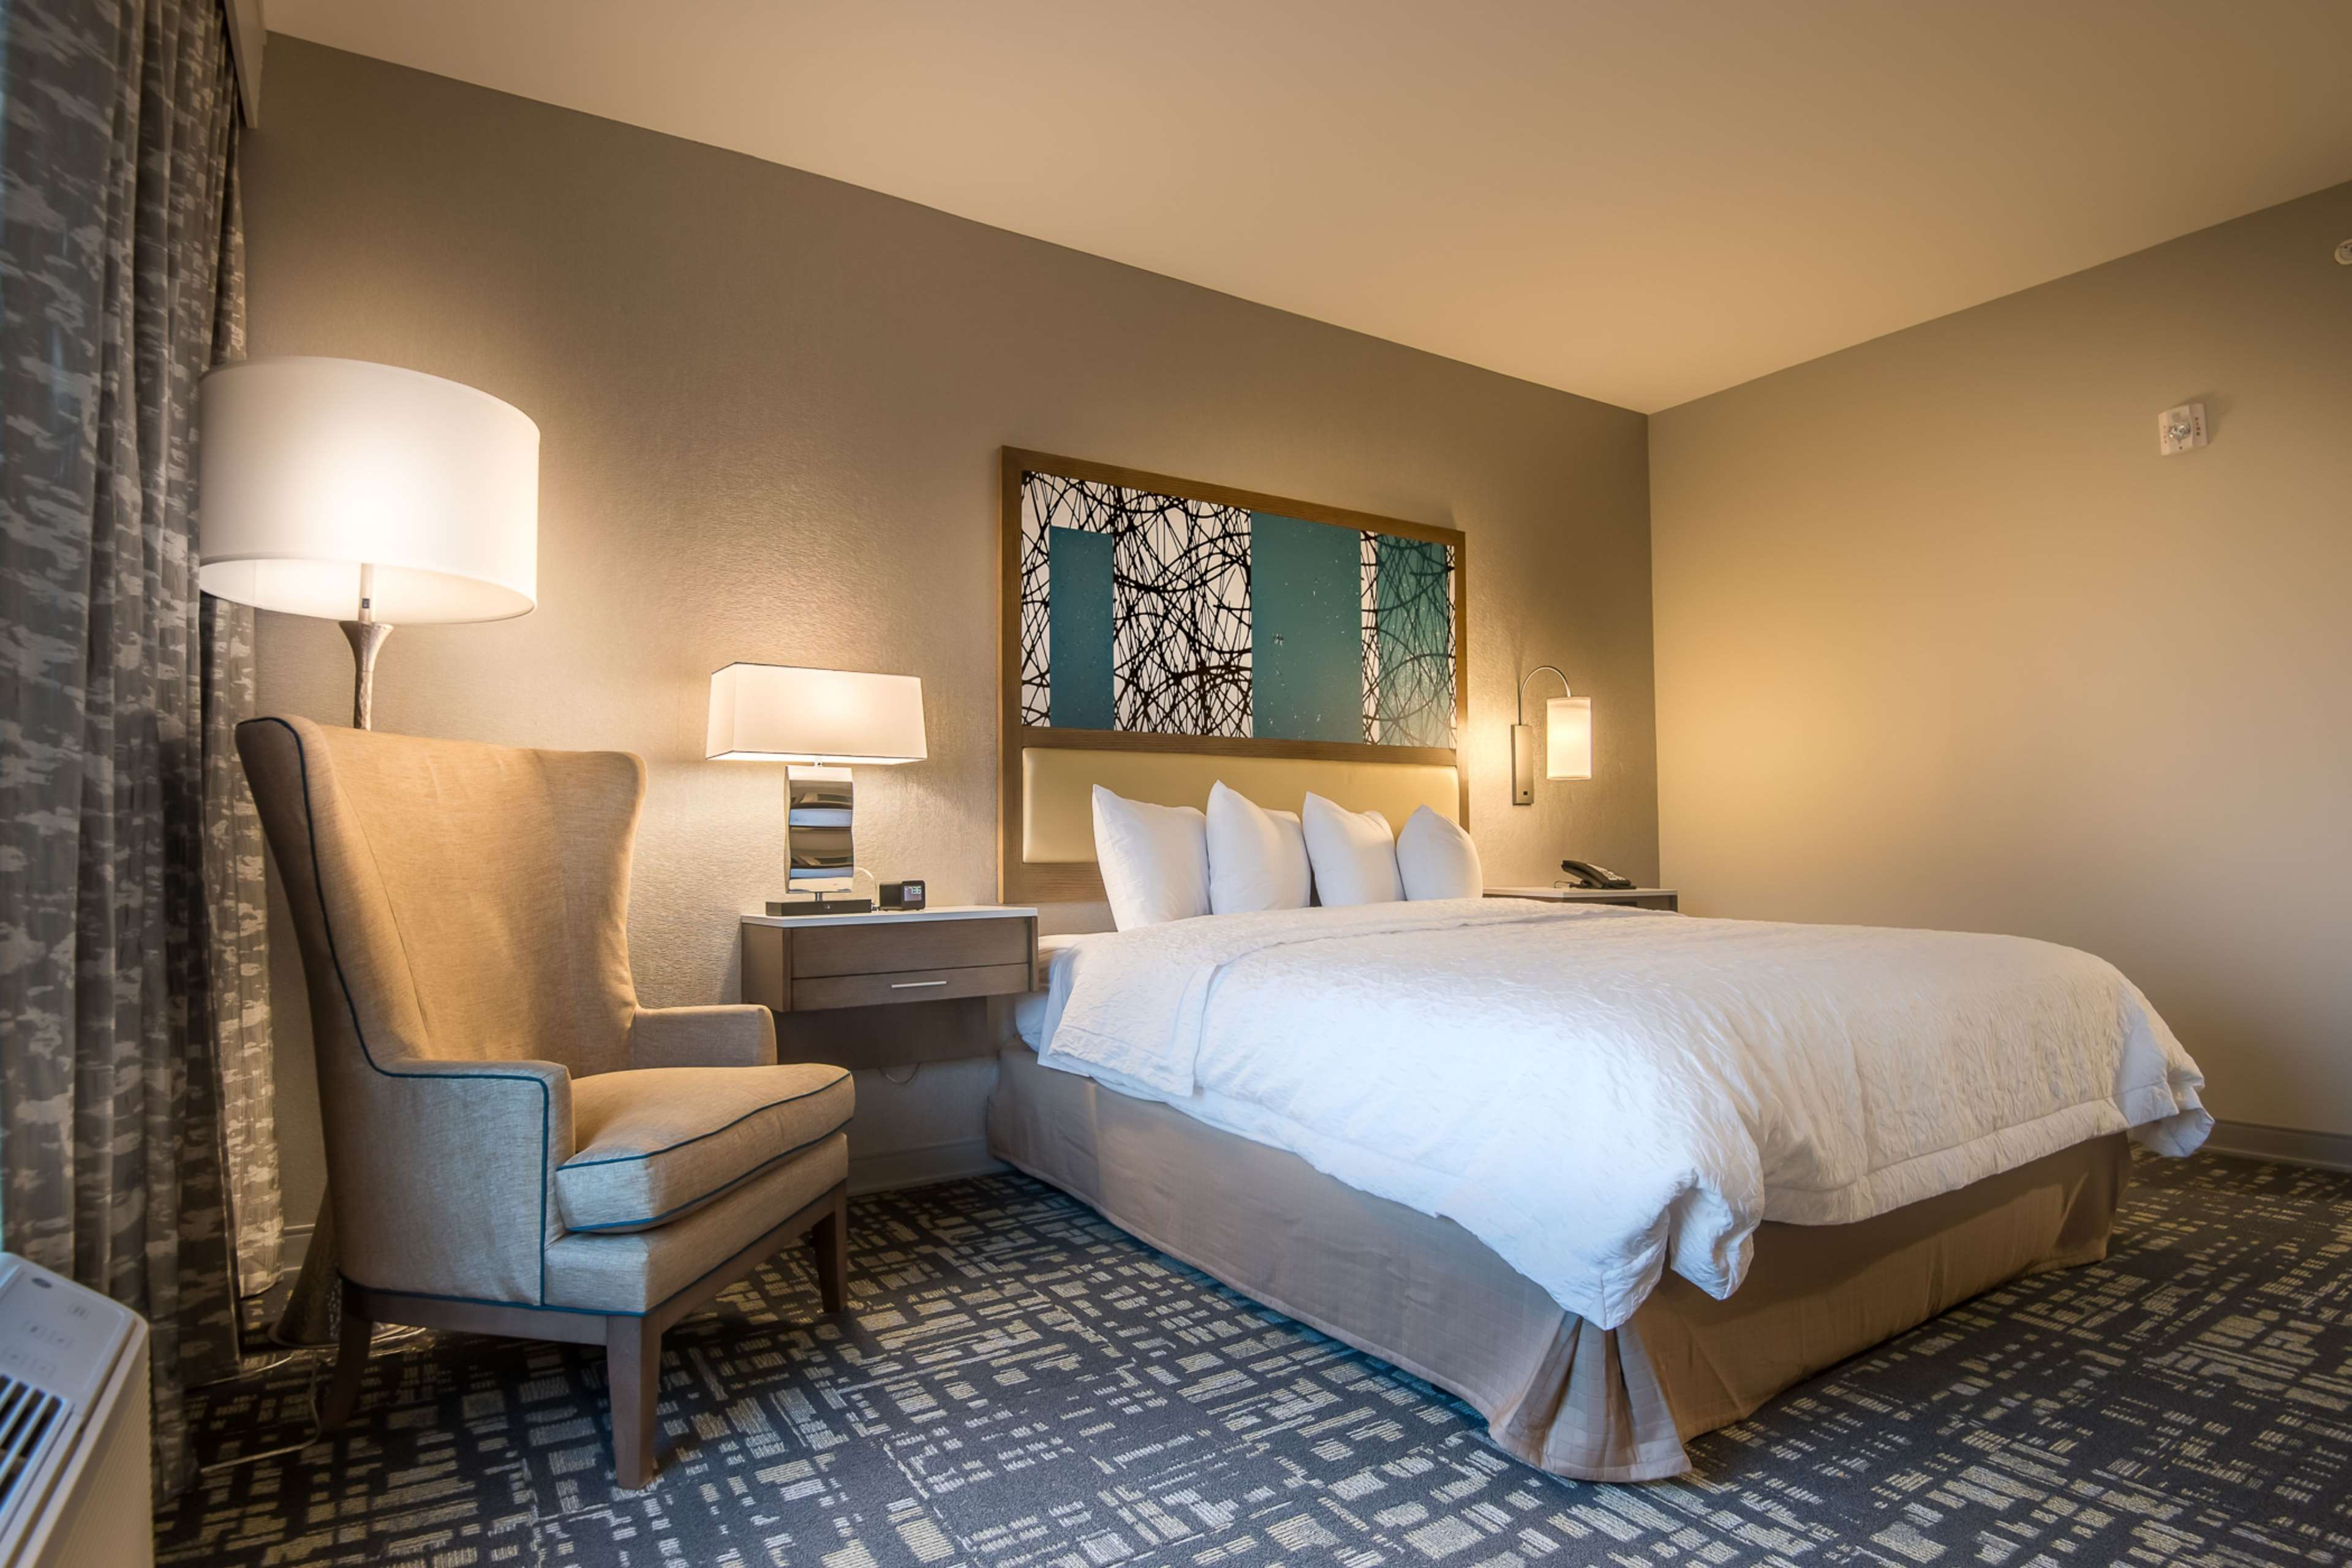 Hampton Inn & Suites Dallas-The Colony, TX image 21